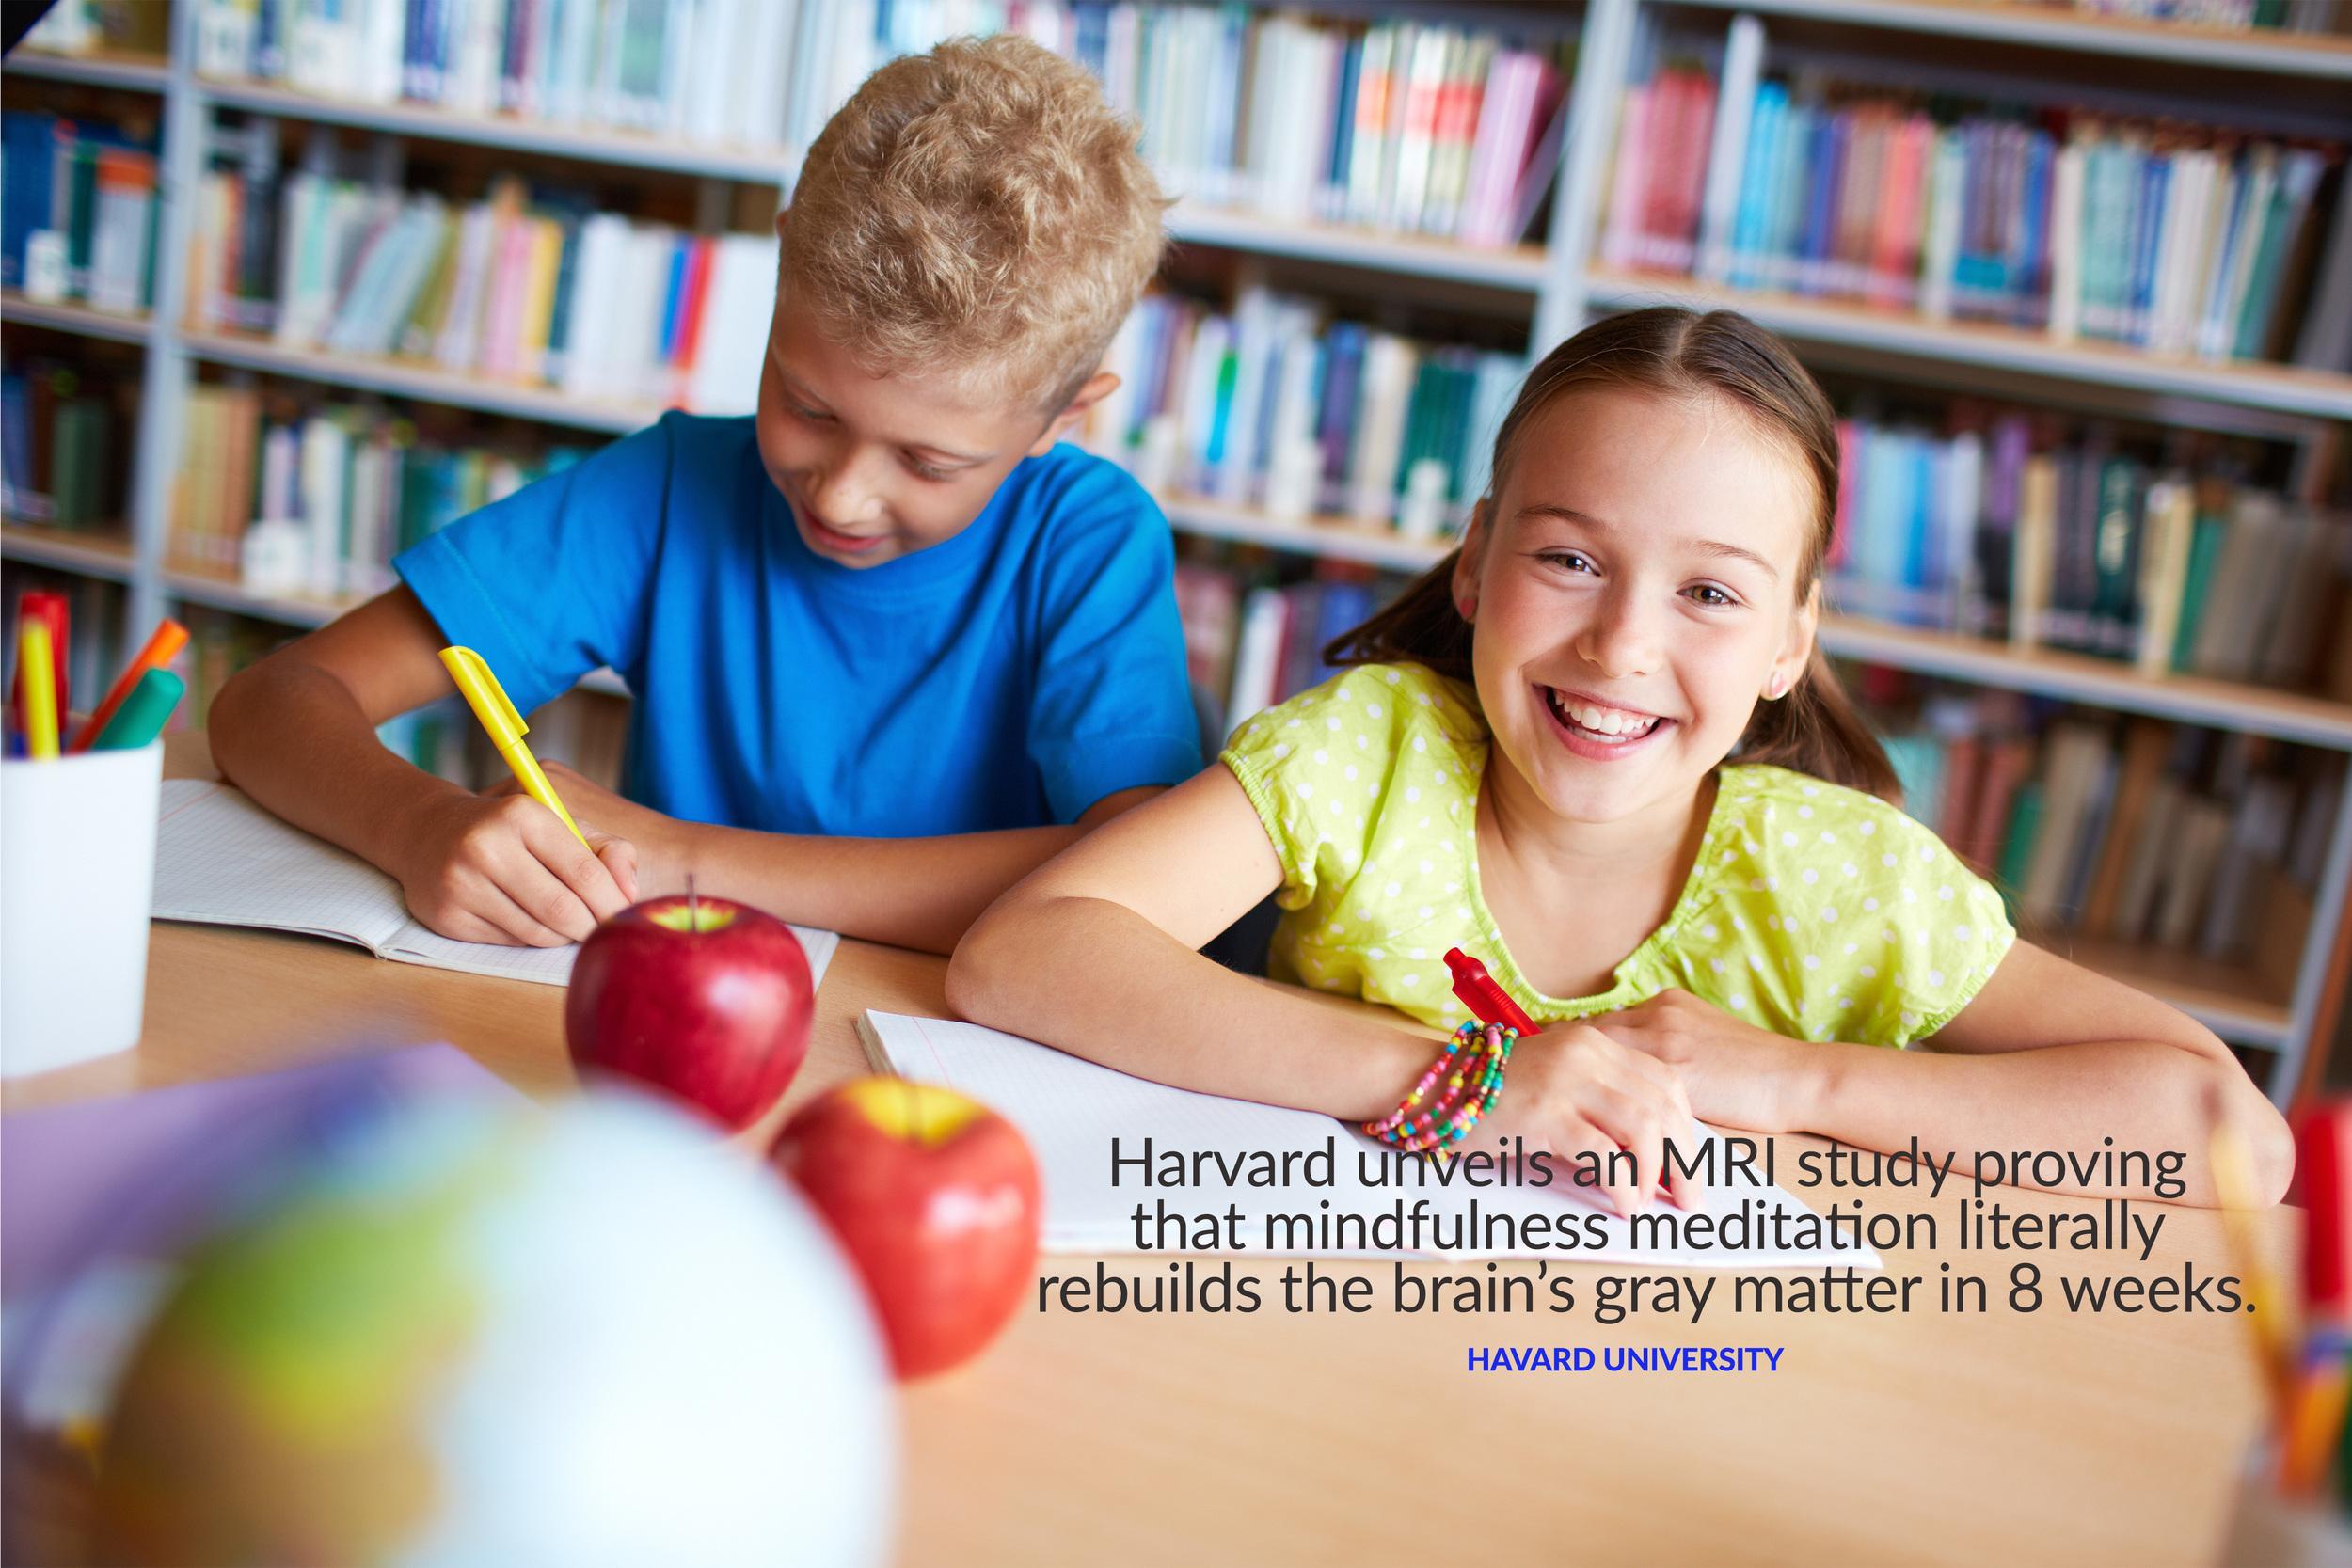 Harvard_TwoSchoolKids.jpg